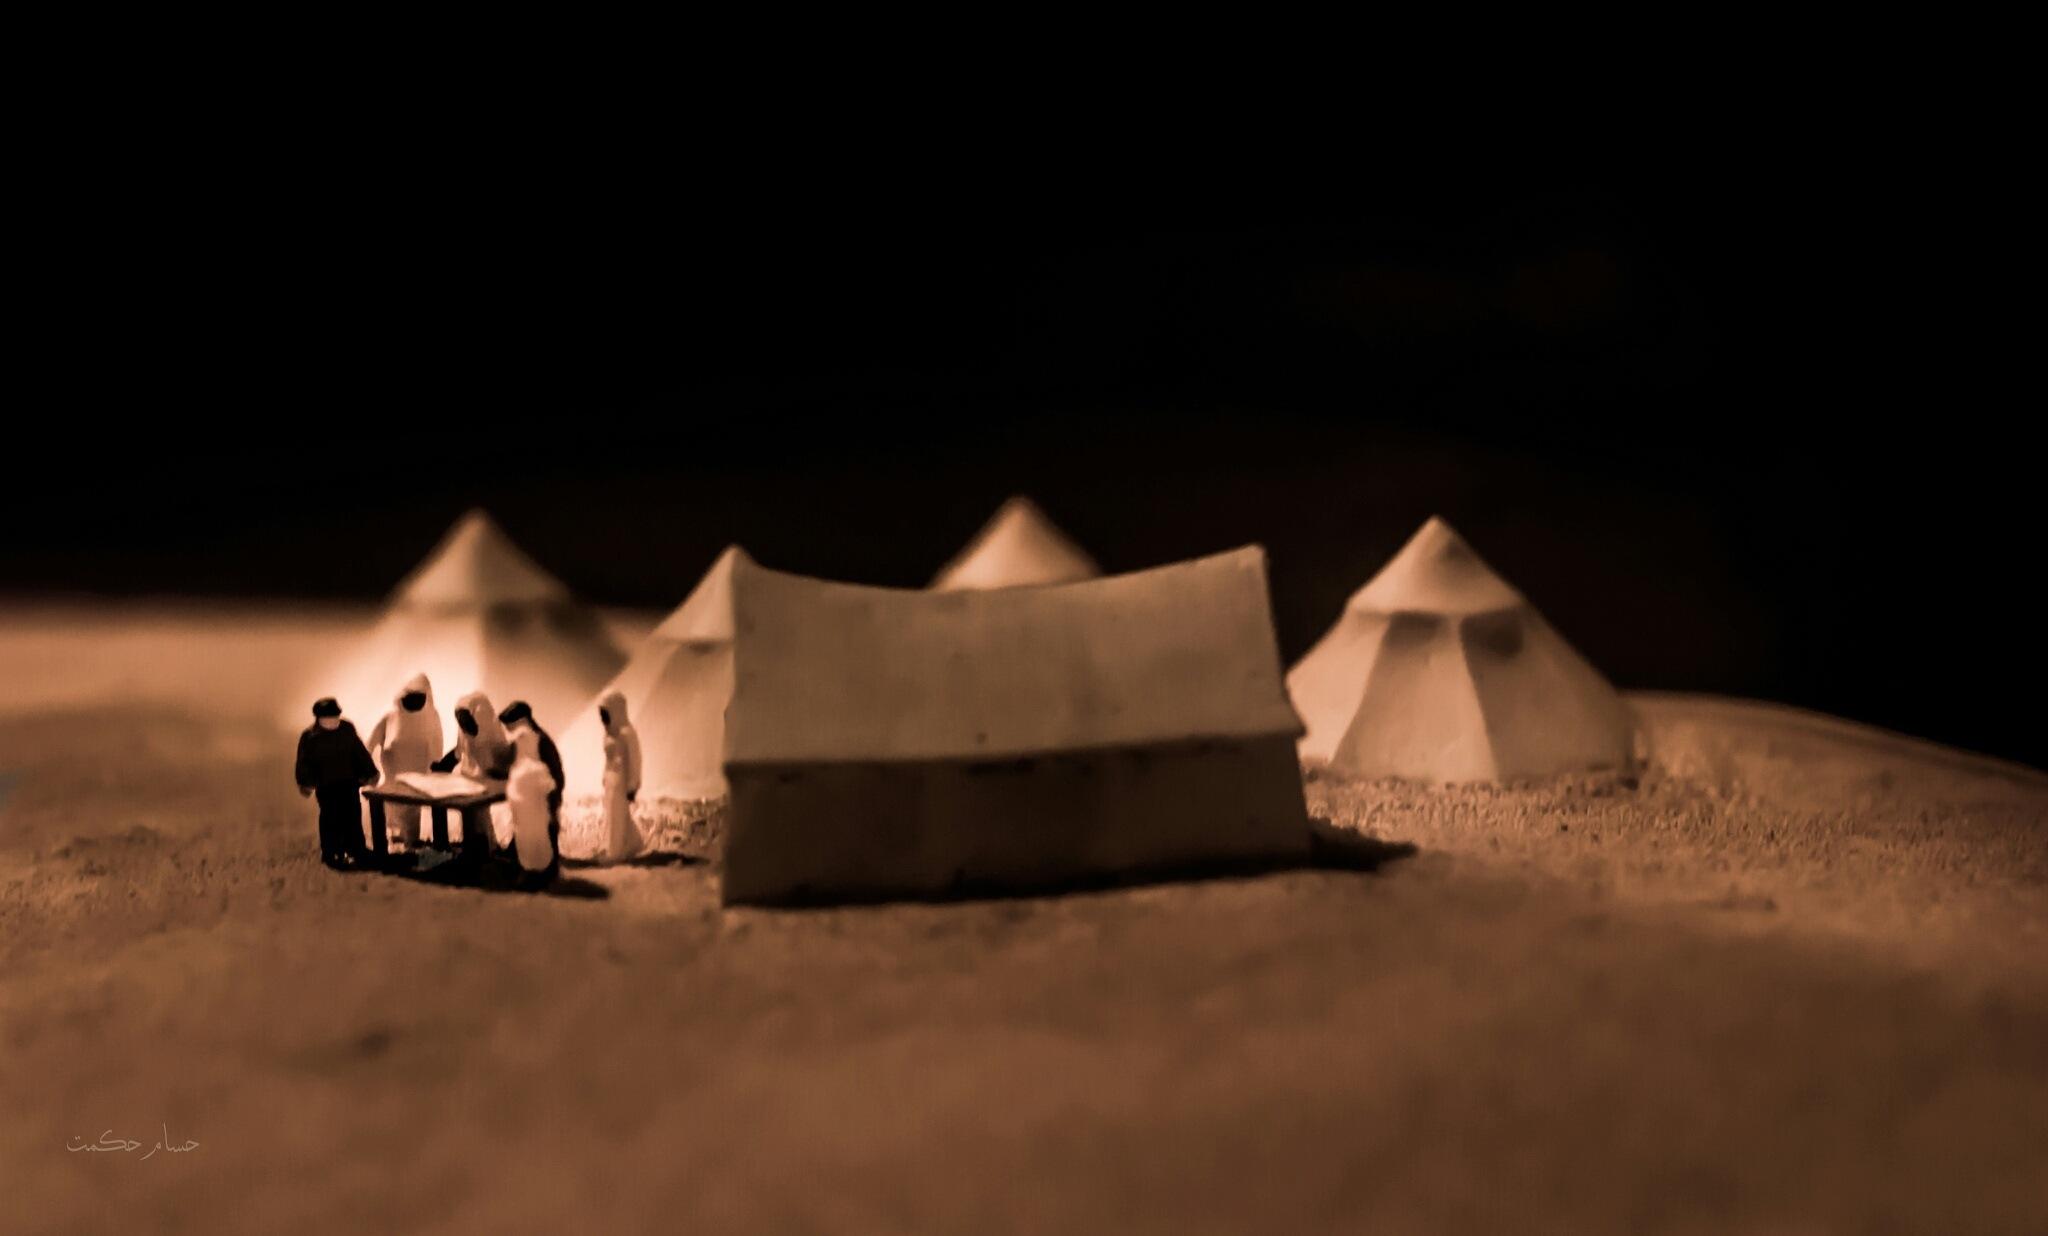 Art sculptures by Husam Hikmat